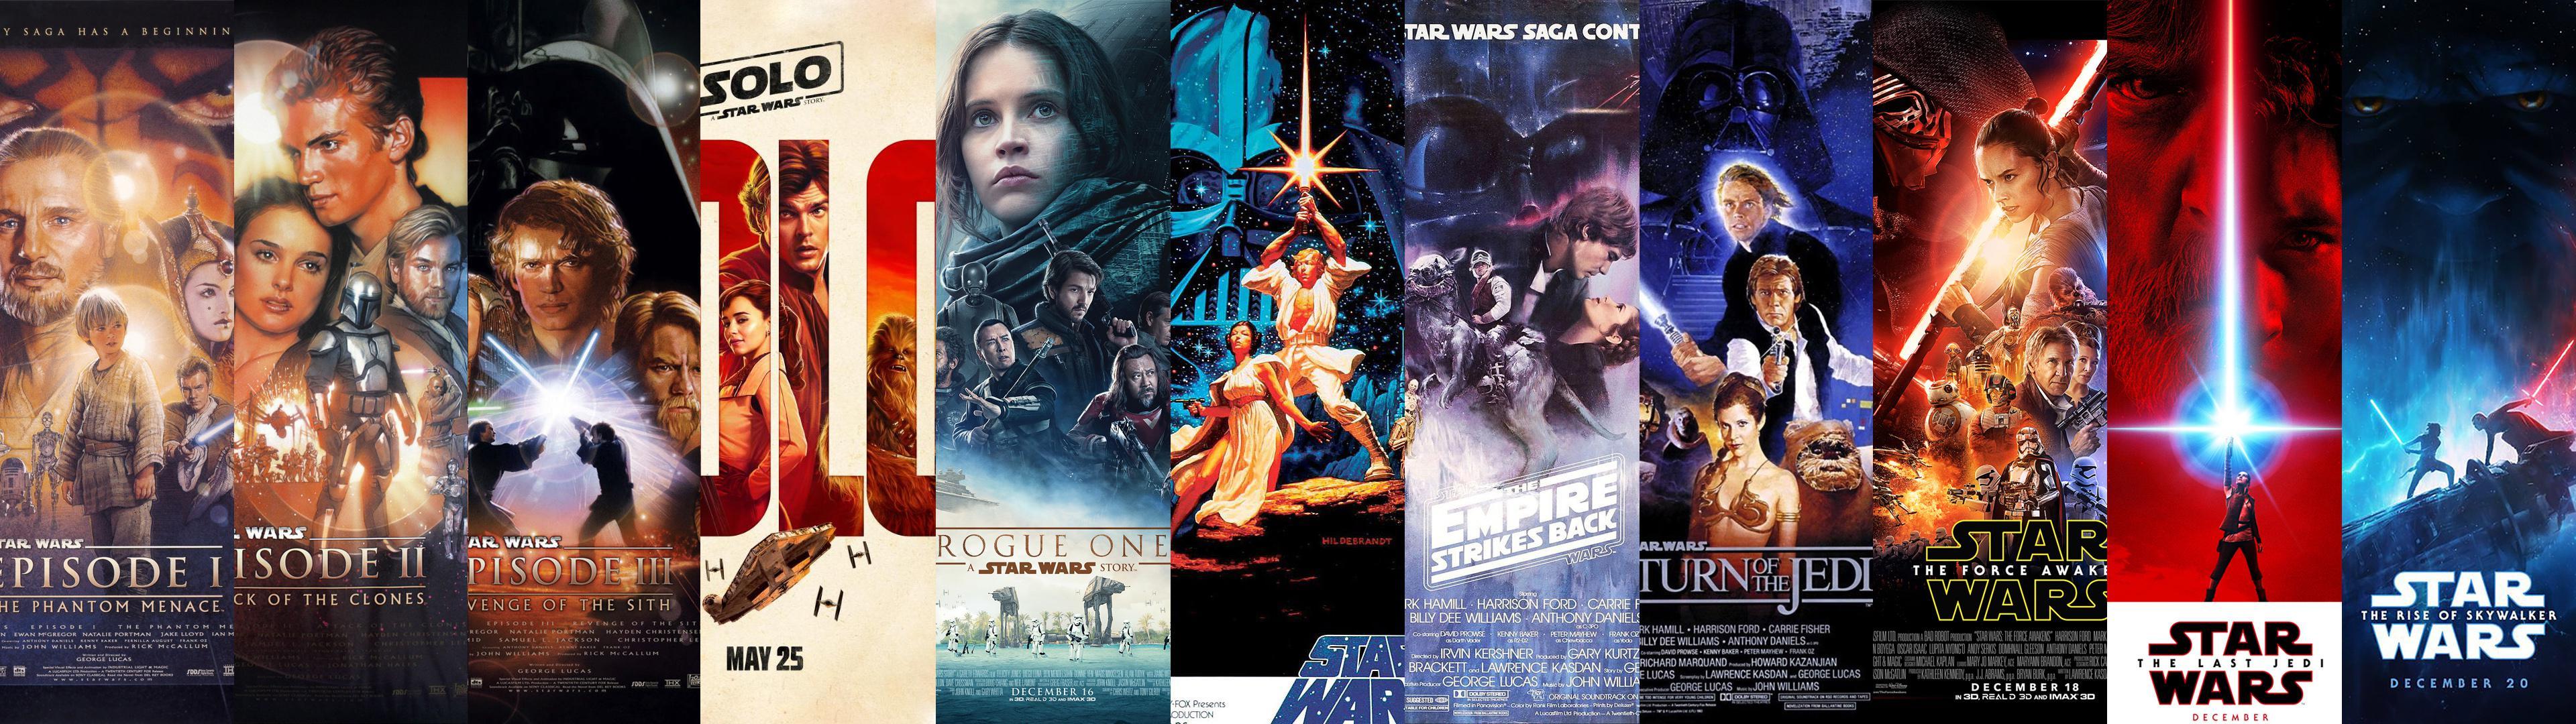 Star Wars Episode 3840x1080 Wallpaper Teahub Io